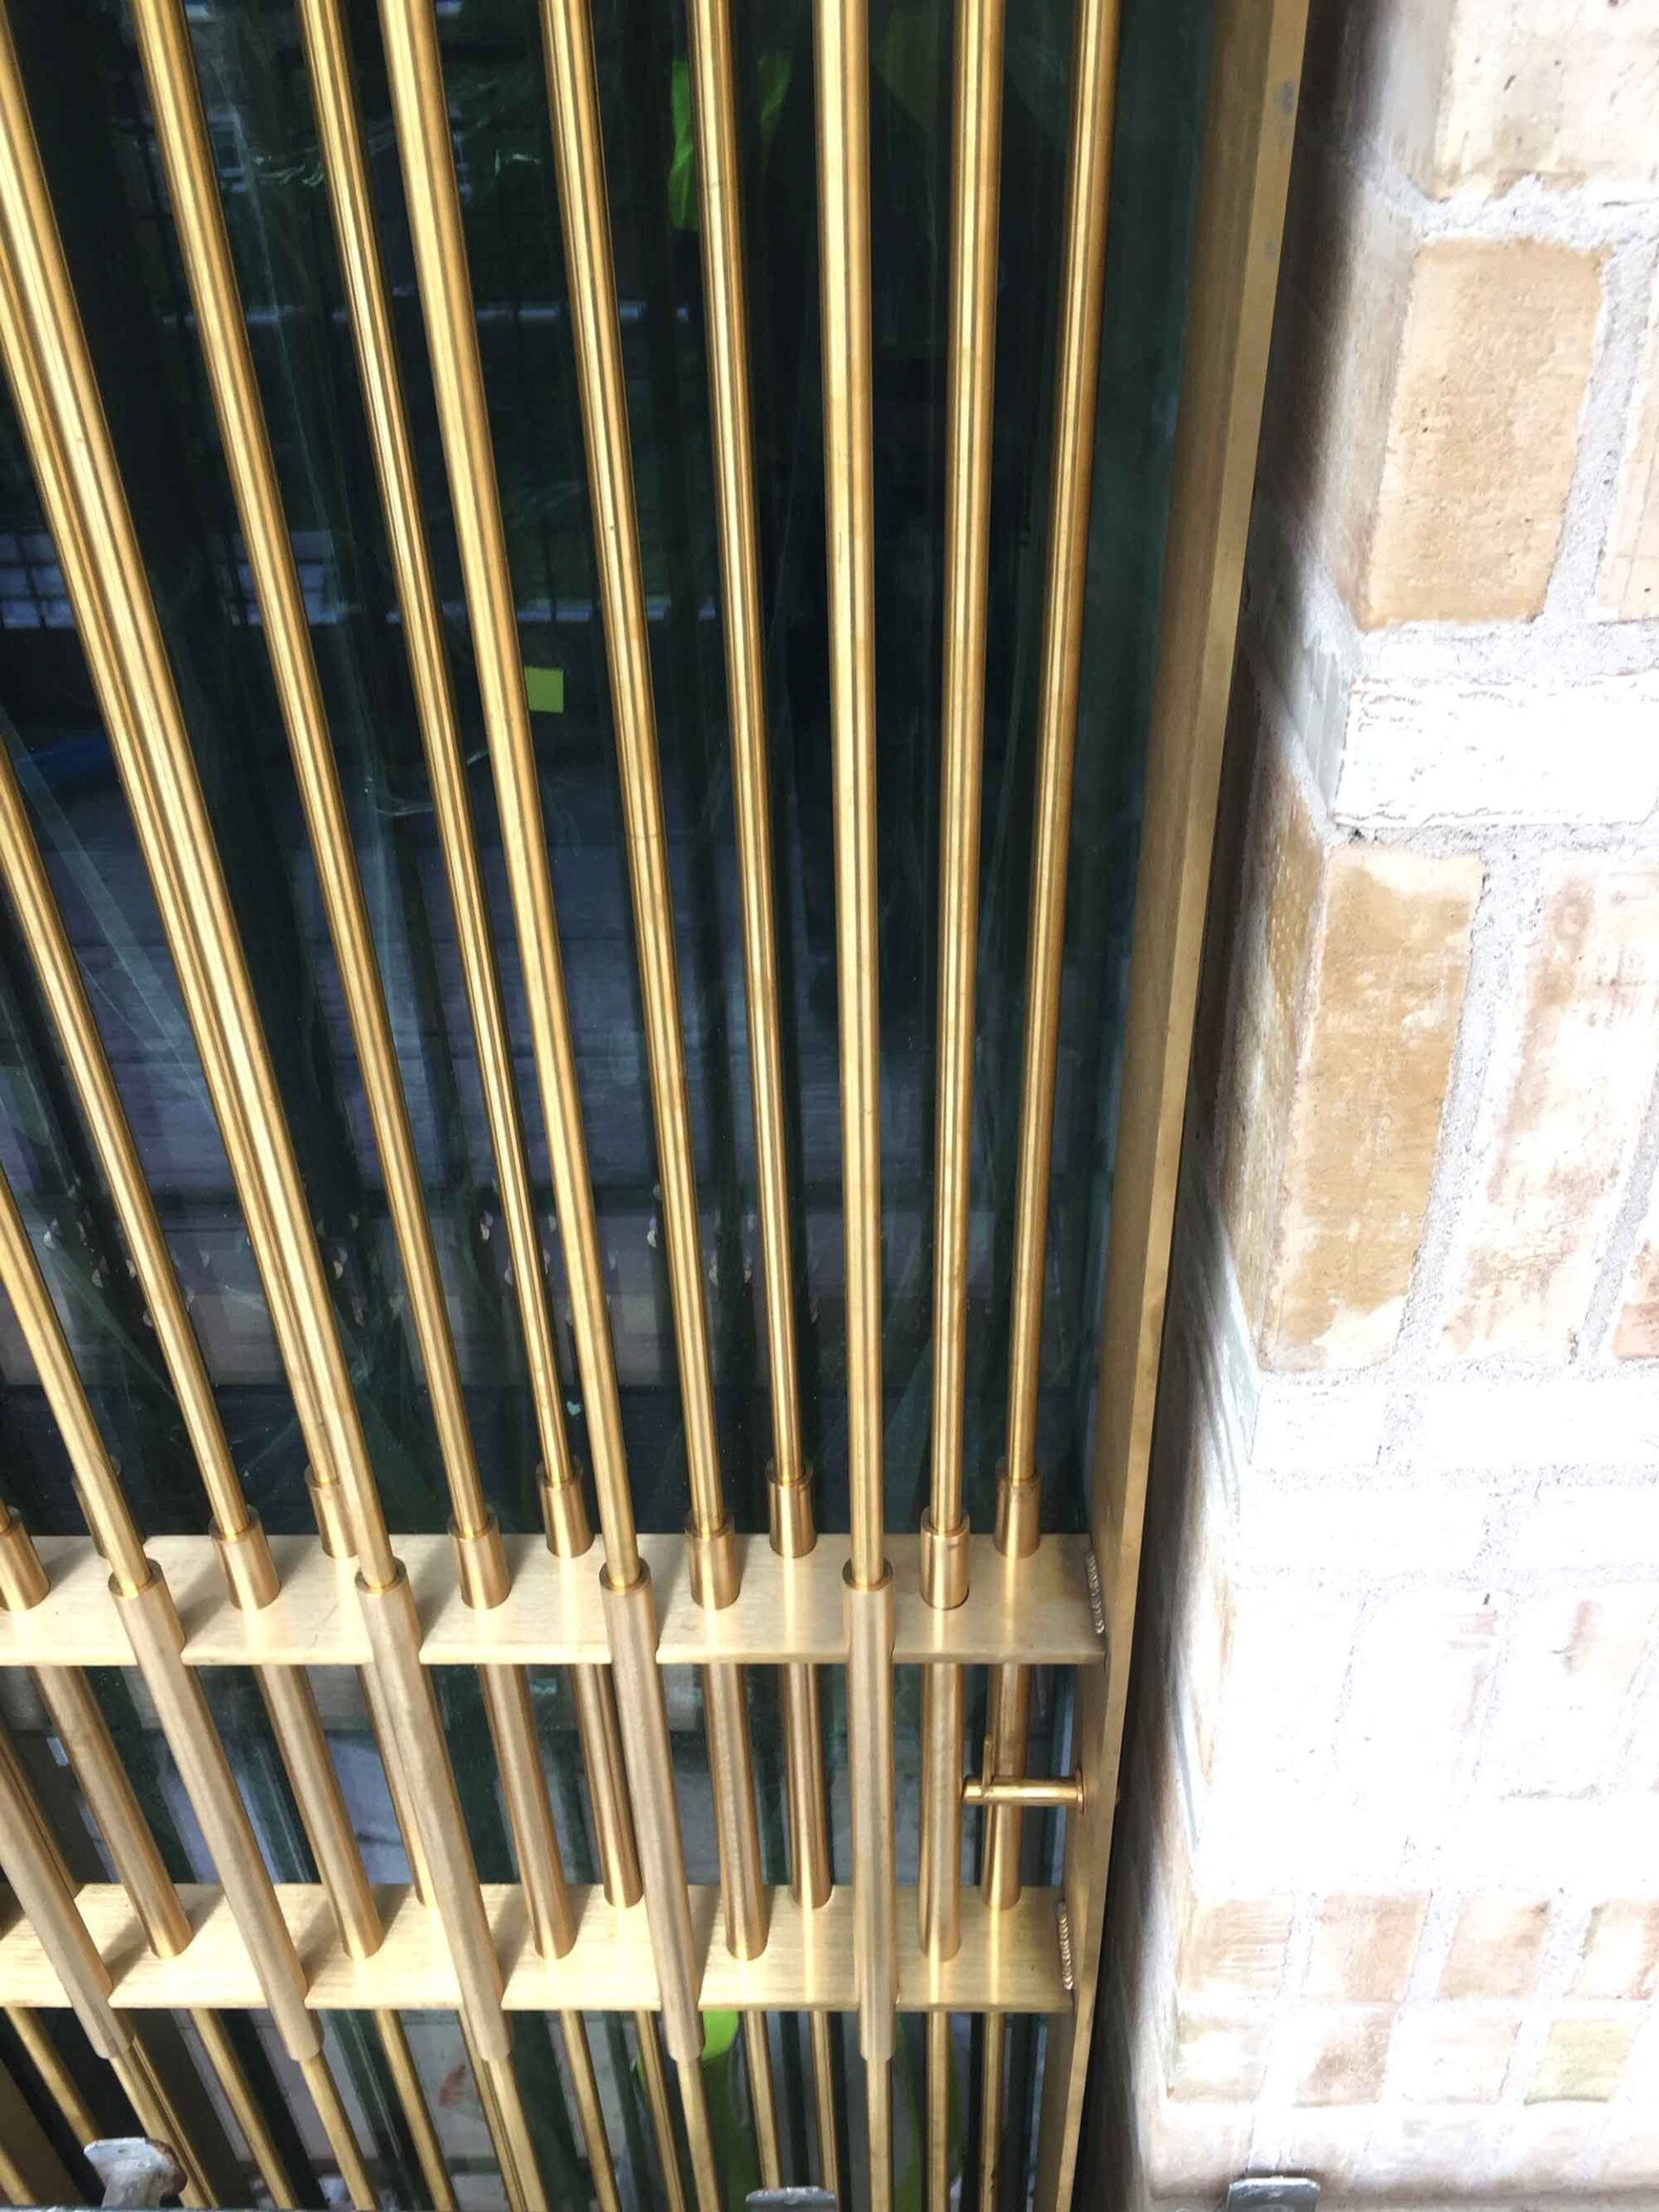 westminster-fire-station-window-metal-screen-details